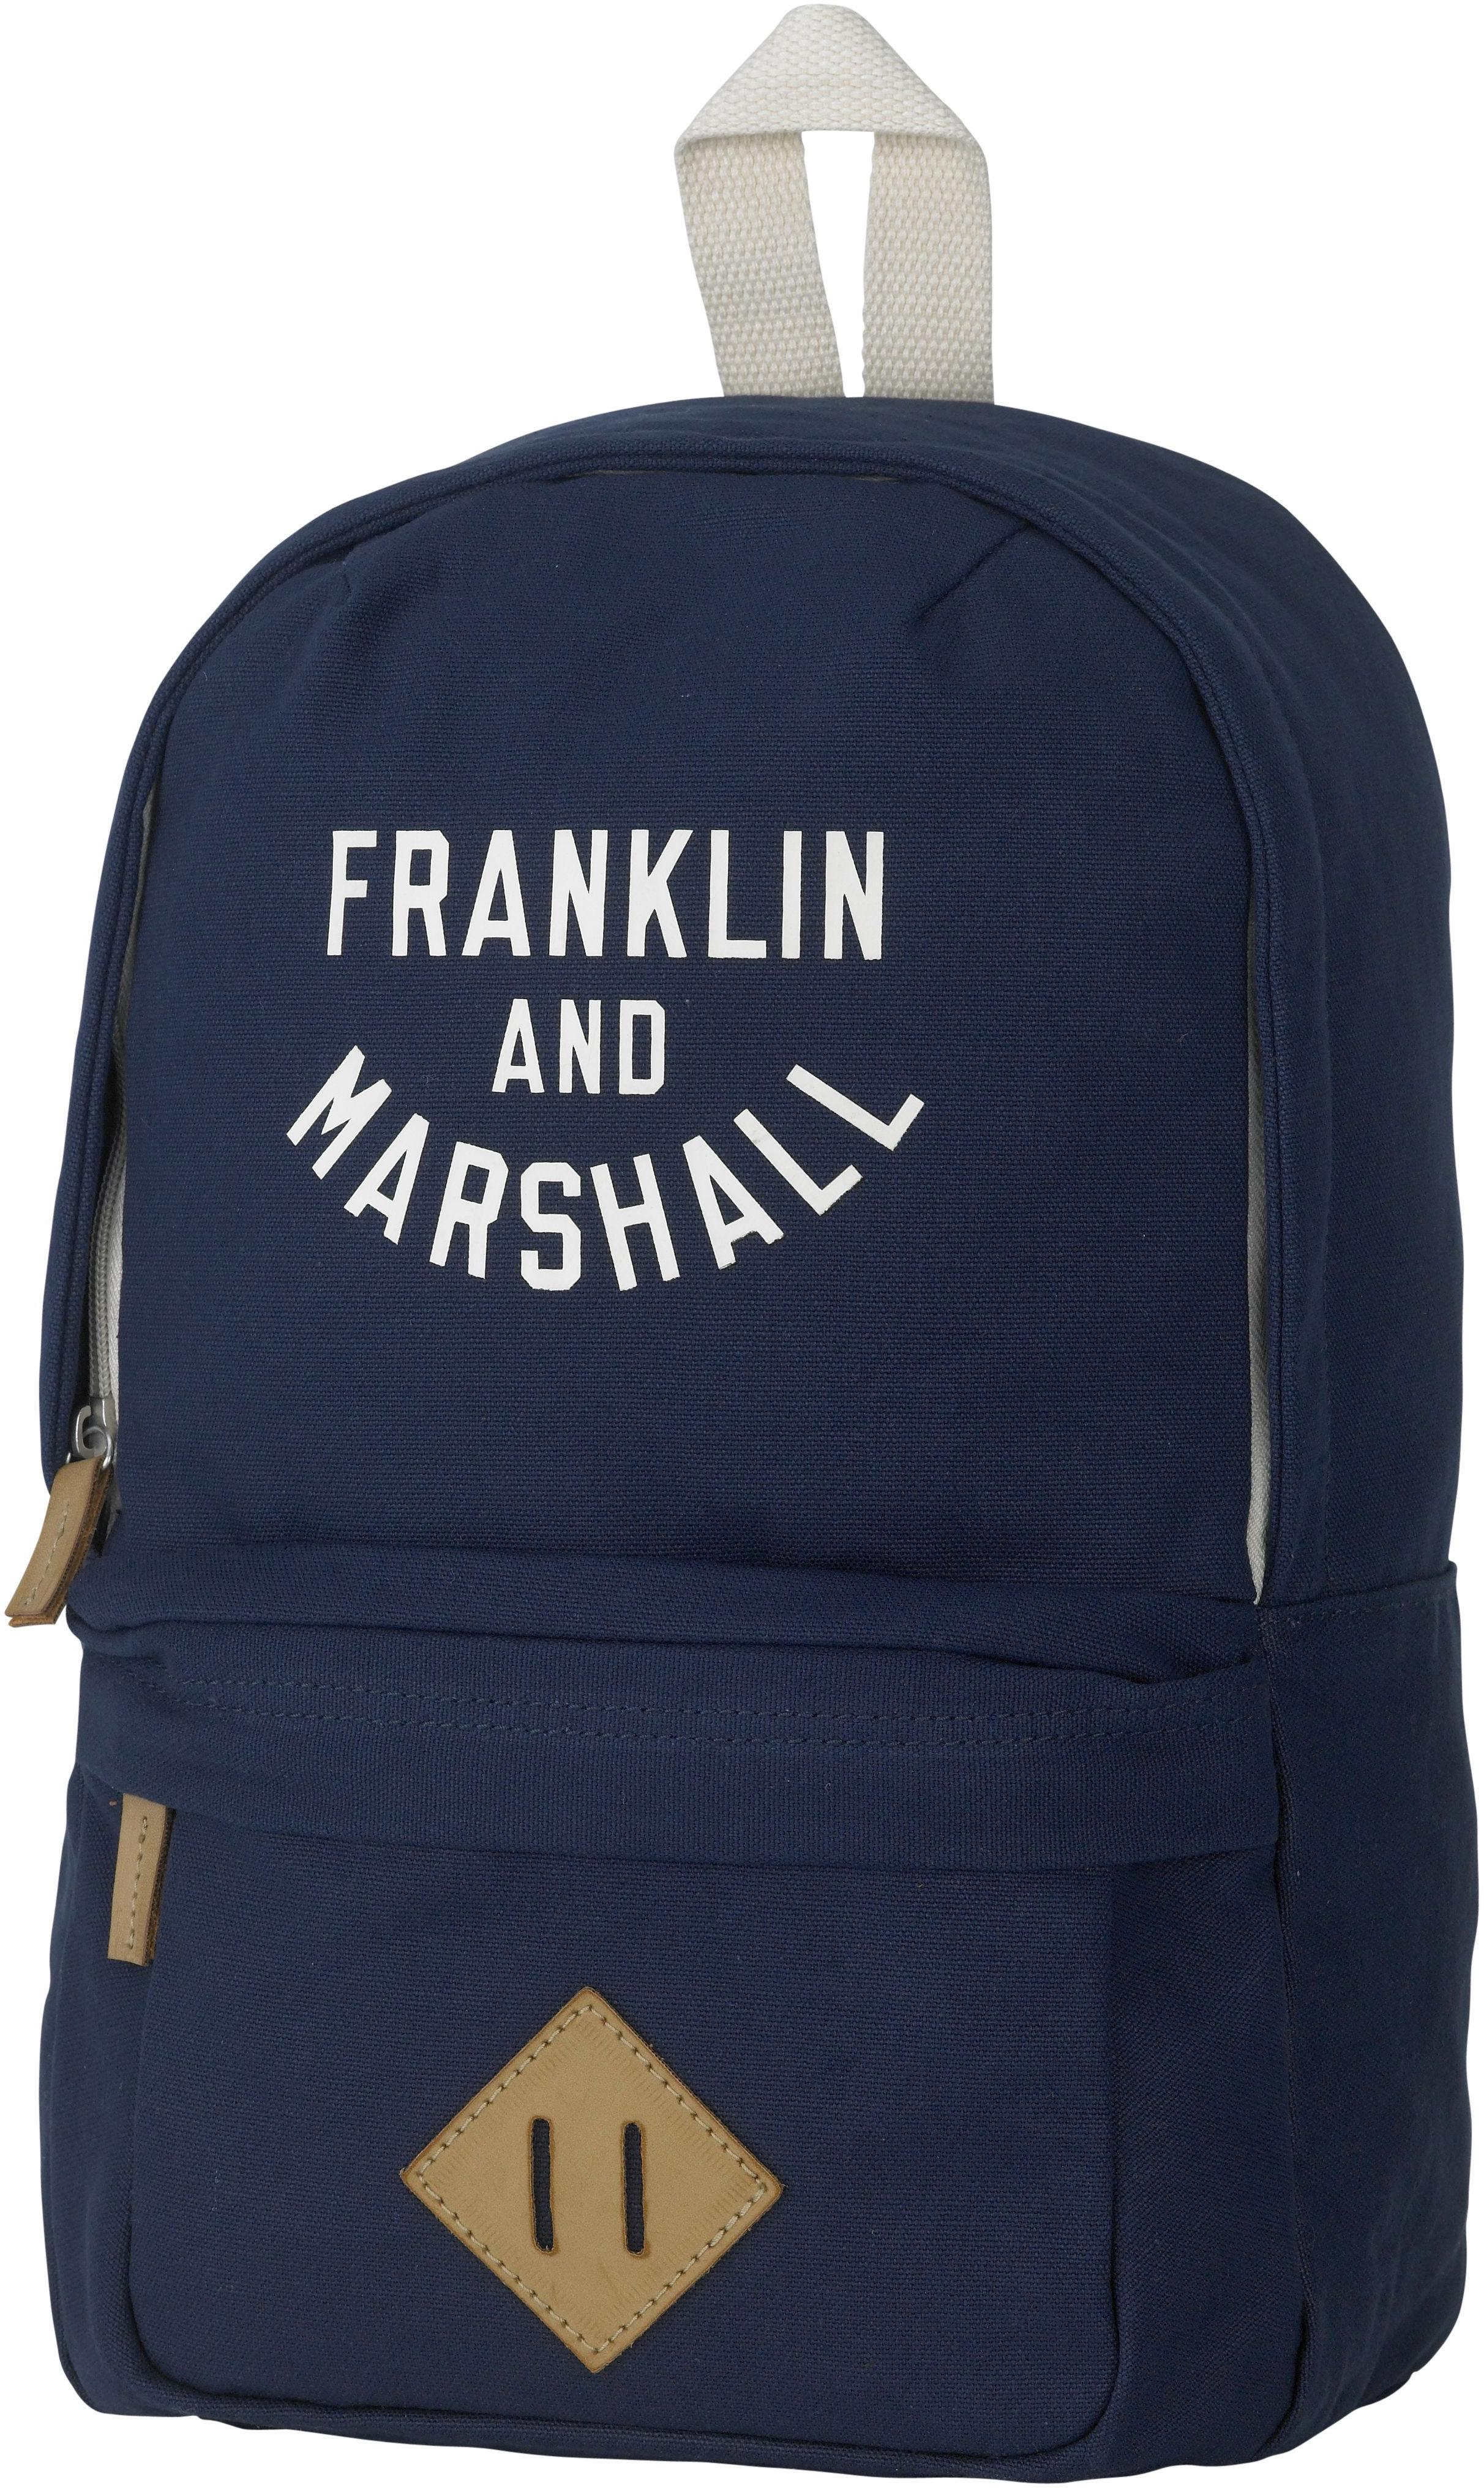 Franklin & Marshall, Rucksack, »Boys Backpack, dunkelblau« | Taschen > Rucksäcke > Sonstige Rucksäcke | Blau | Polyester | FRANKLIN & MARSHALL